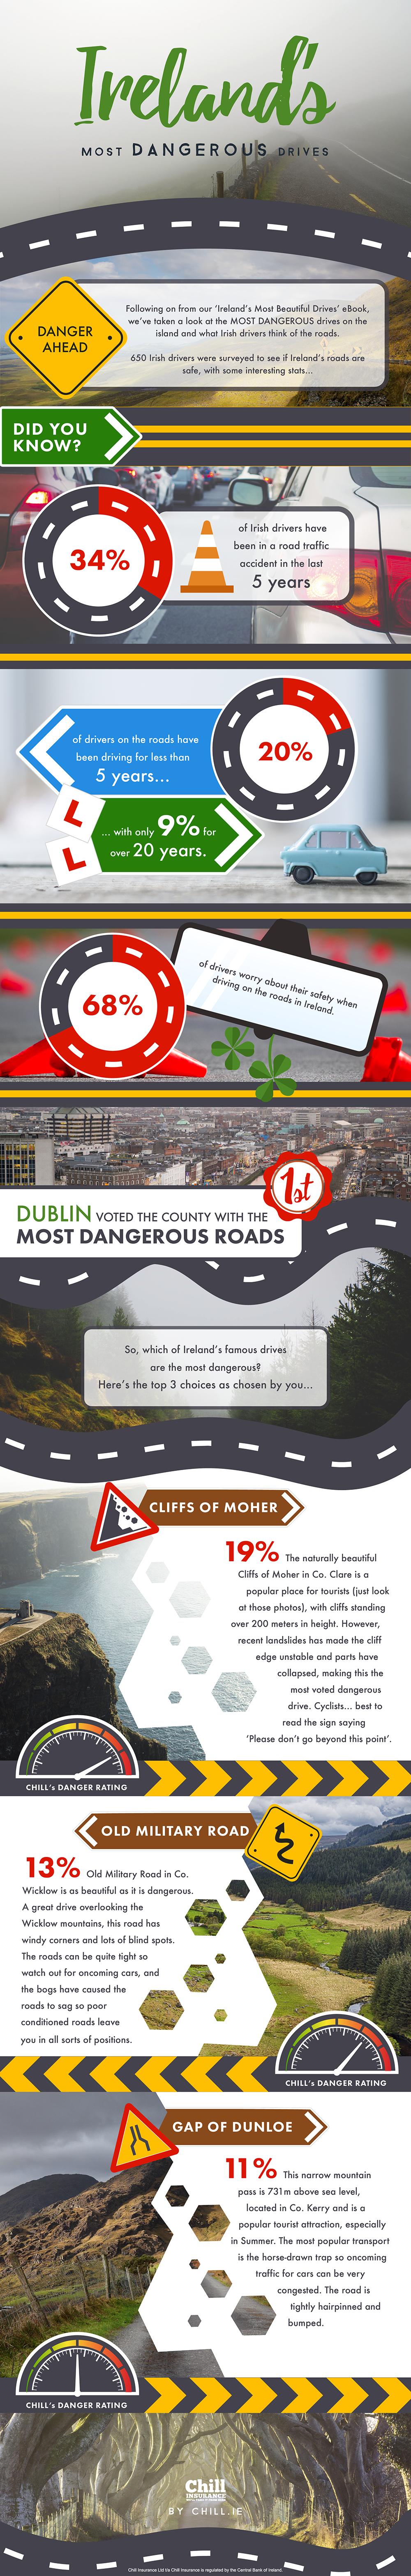 dangerous drives infographic